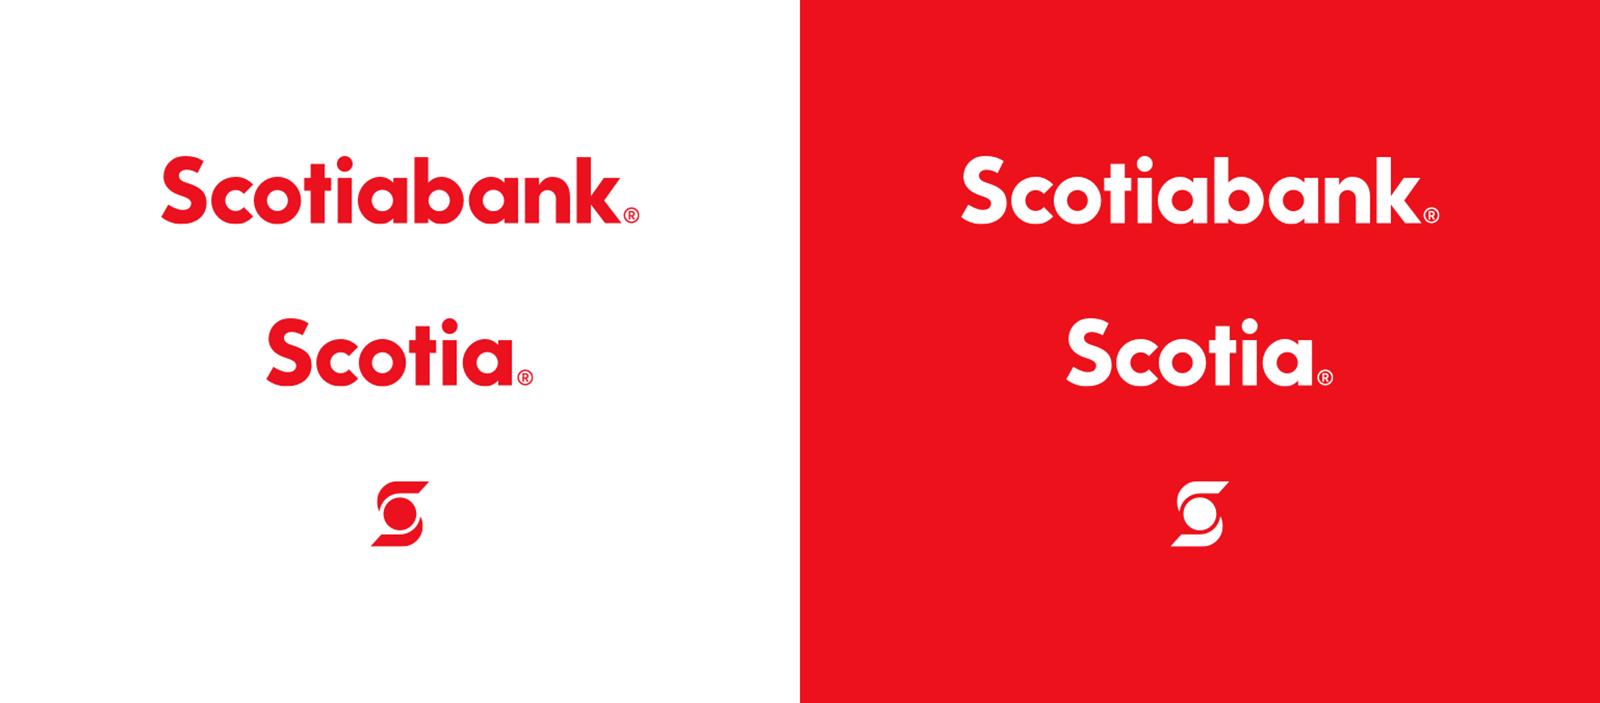 Scotiabank啟用全新的品牌logo和VI視覺形象設計-深圳VI設計5